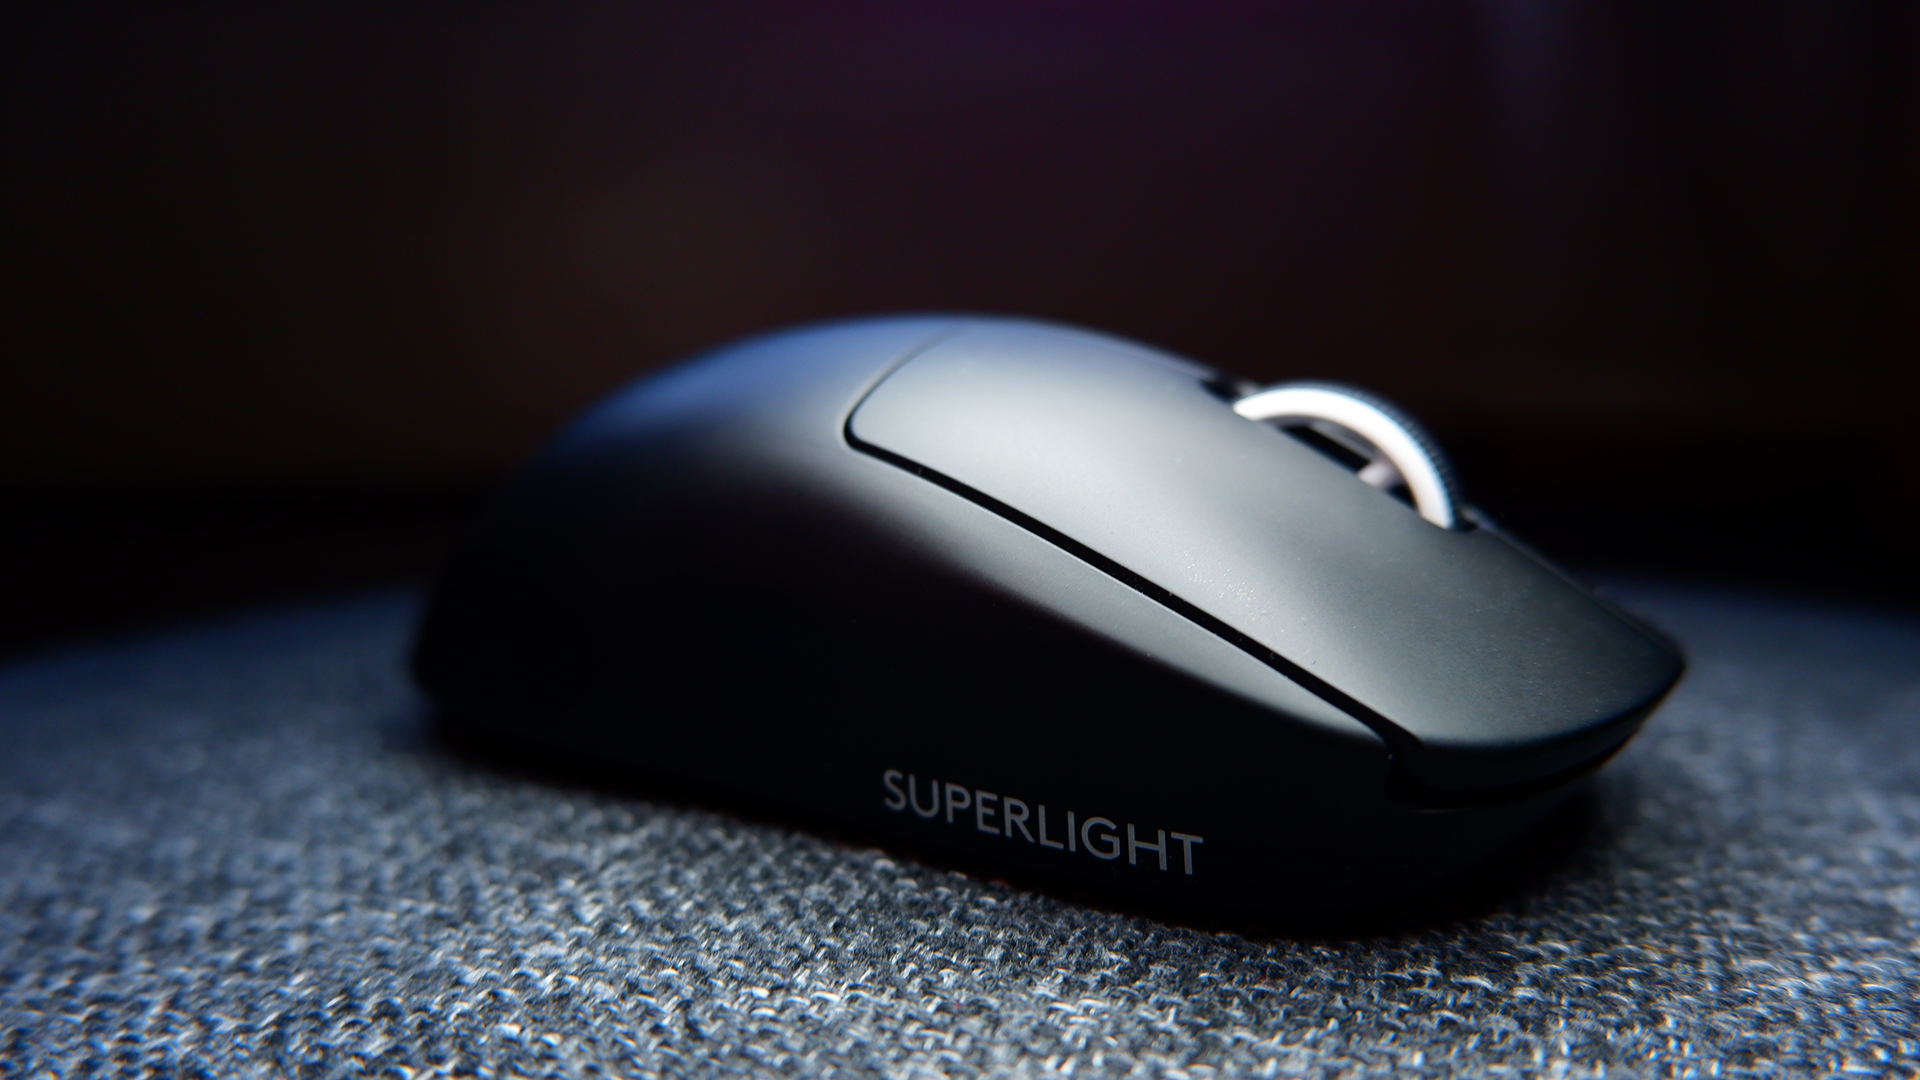 Logitech G Pro X Superlight 1